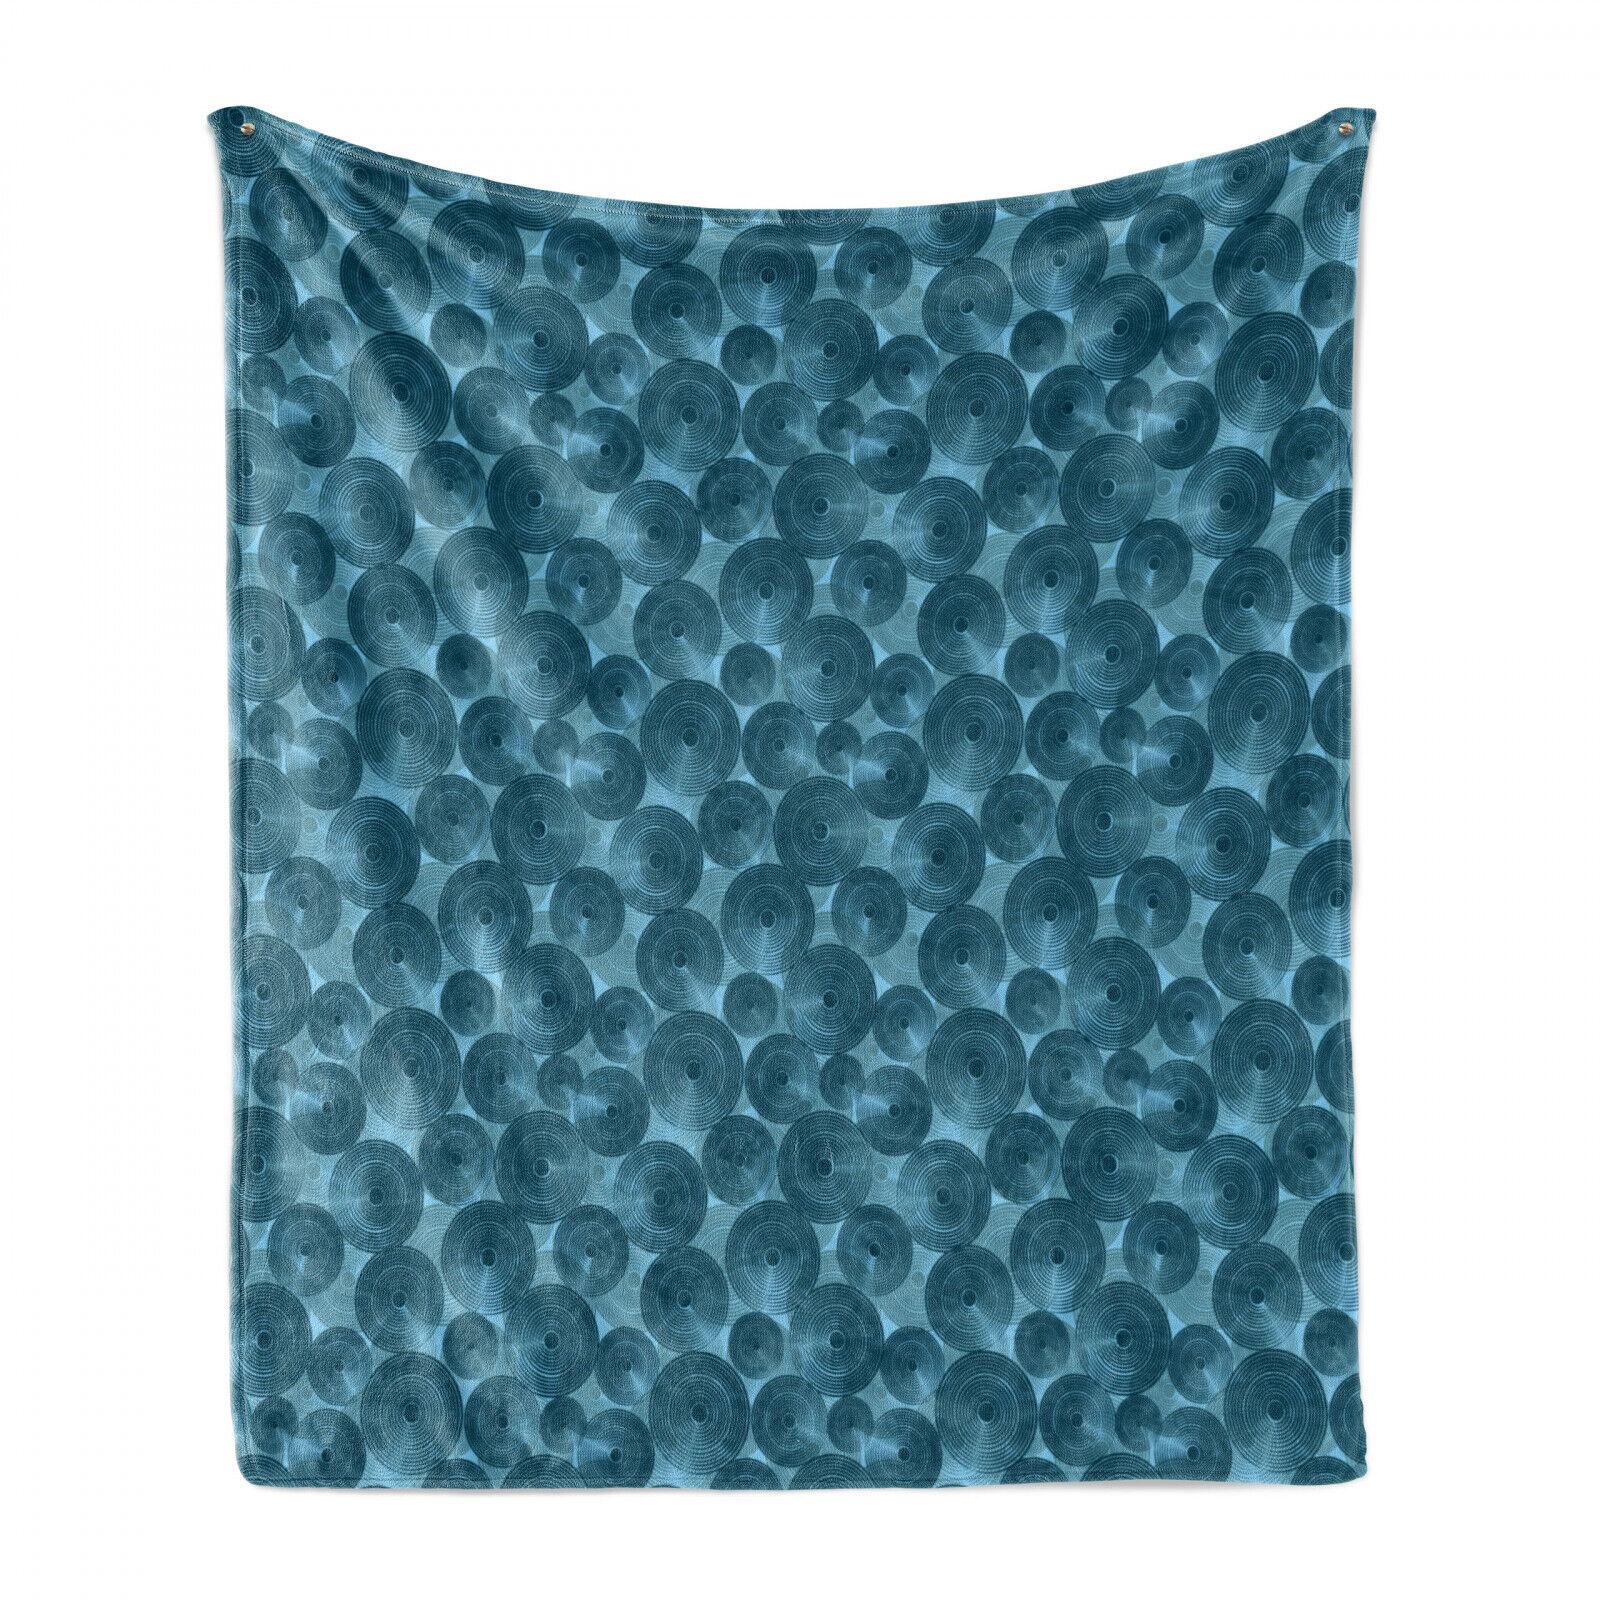 Modern Soft Flannel Fleece Blanket Circle Dots Rounded Tile